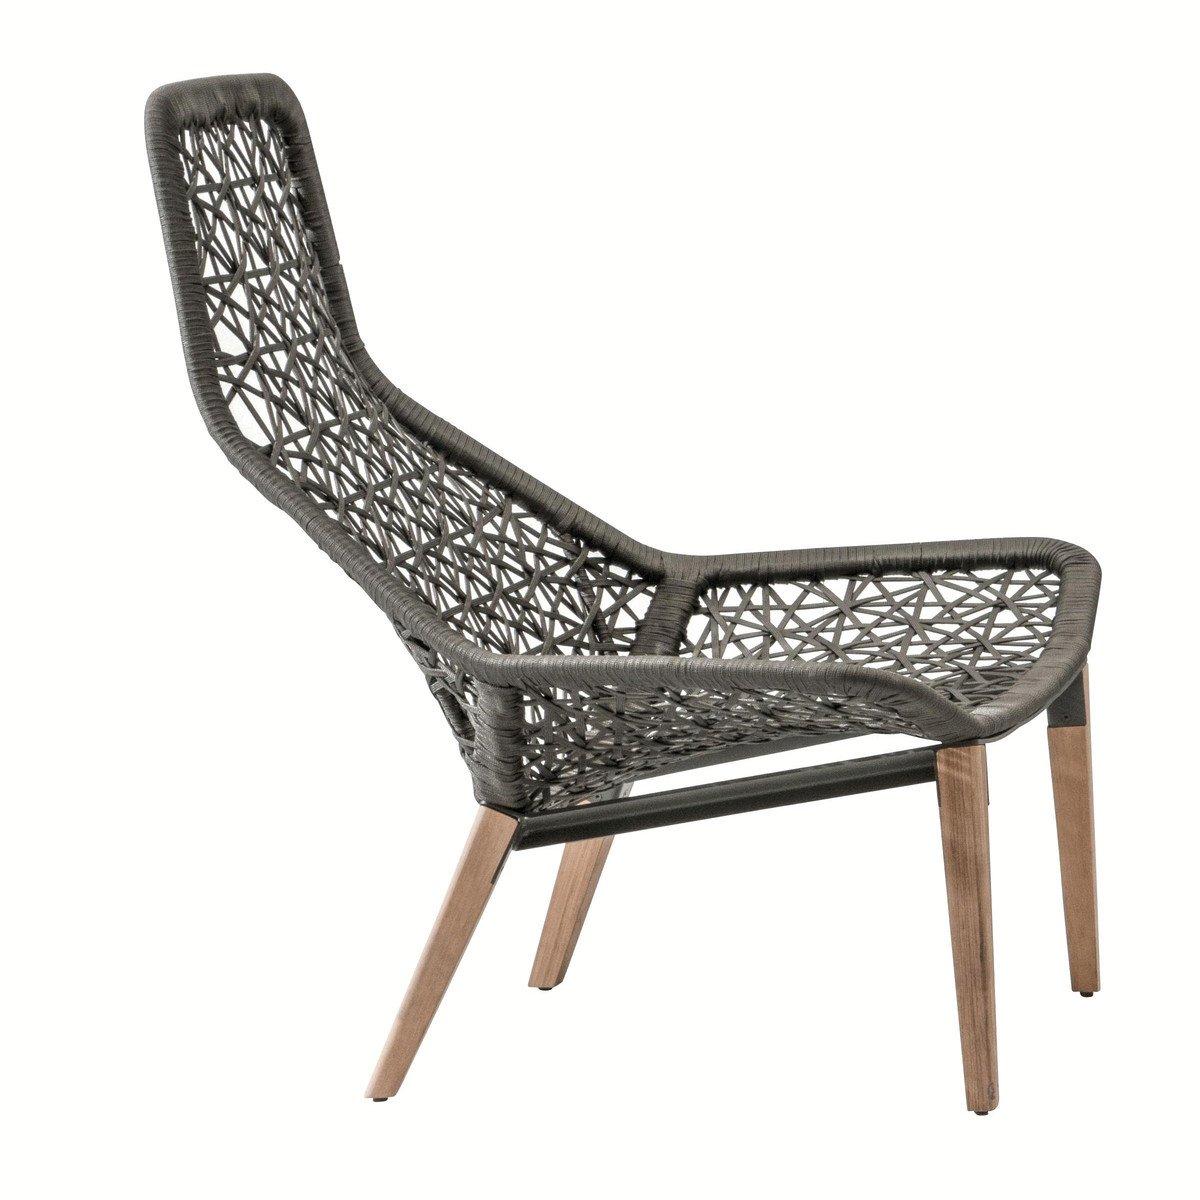 Maia Relax Fauteuil De Jardin Piètement En Kettal - Relax fauteuil